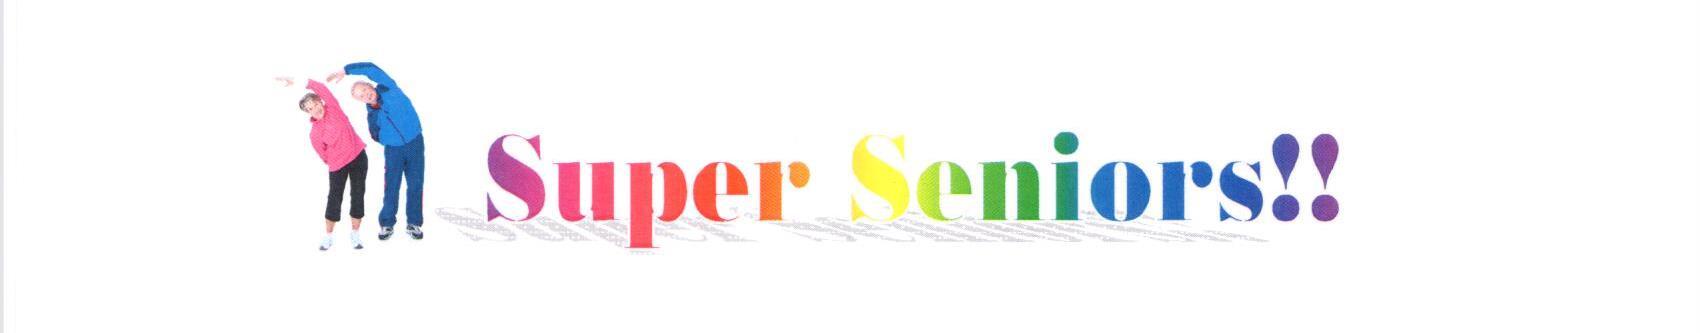 Senior Services Lincoln Park Nj Official Website